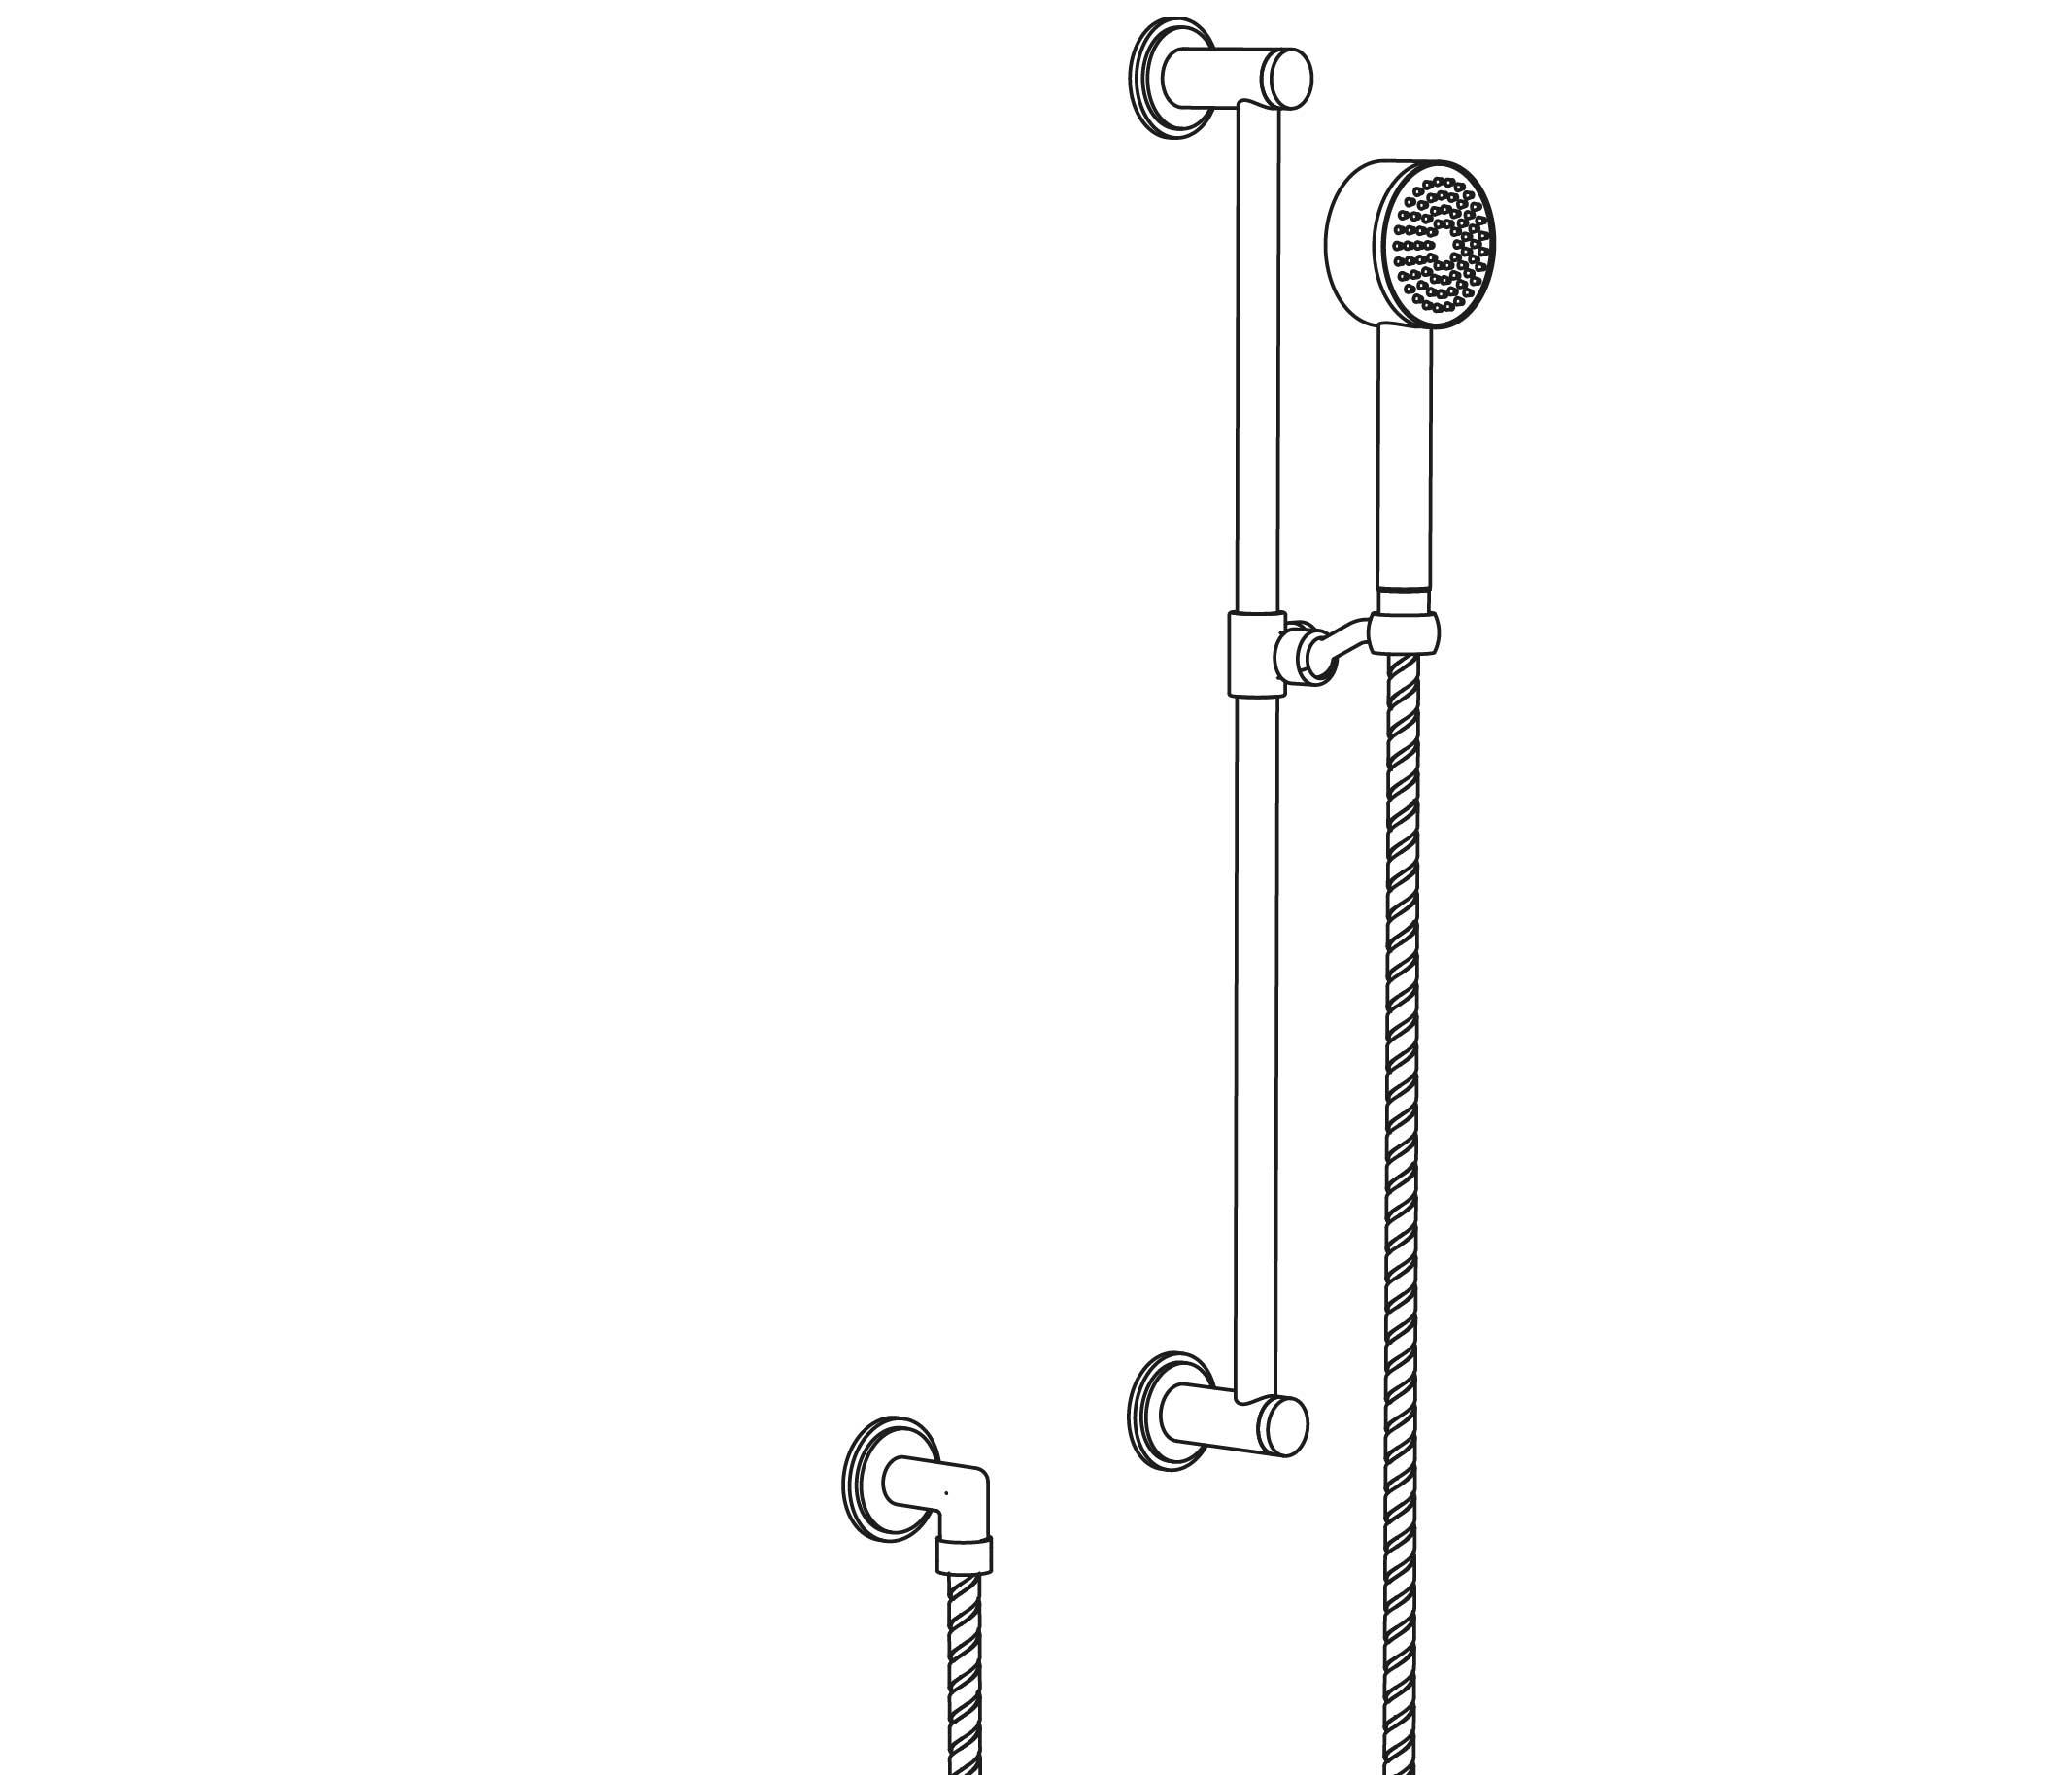 C31-2211 Wall shower set on sliding bar